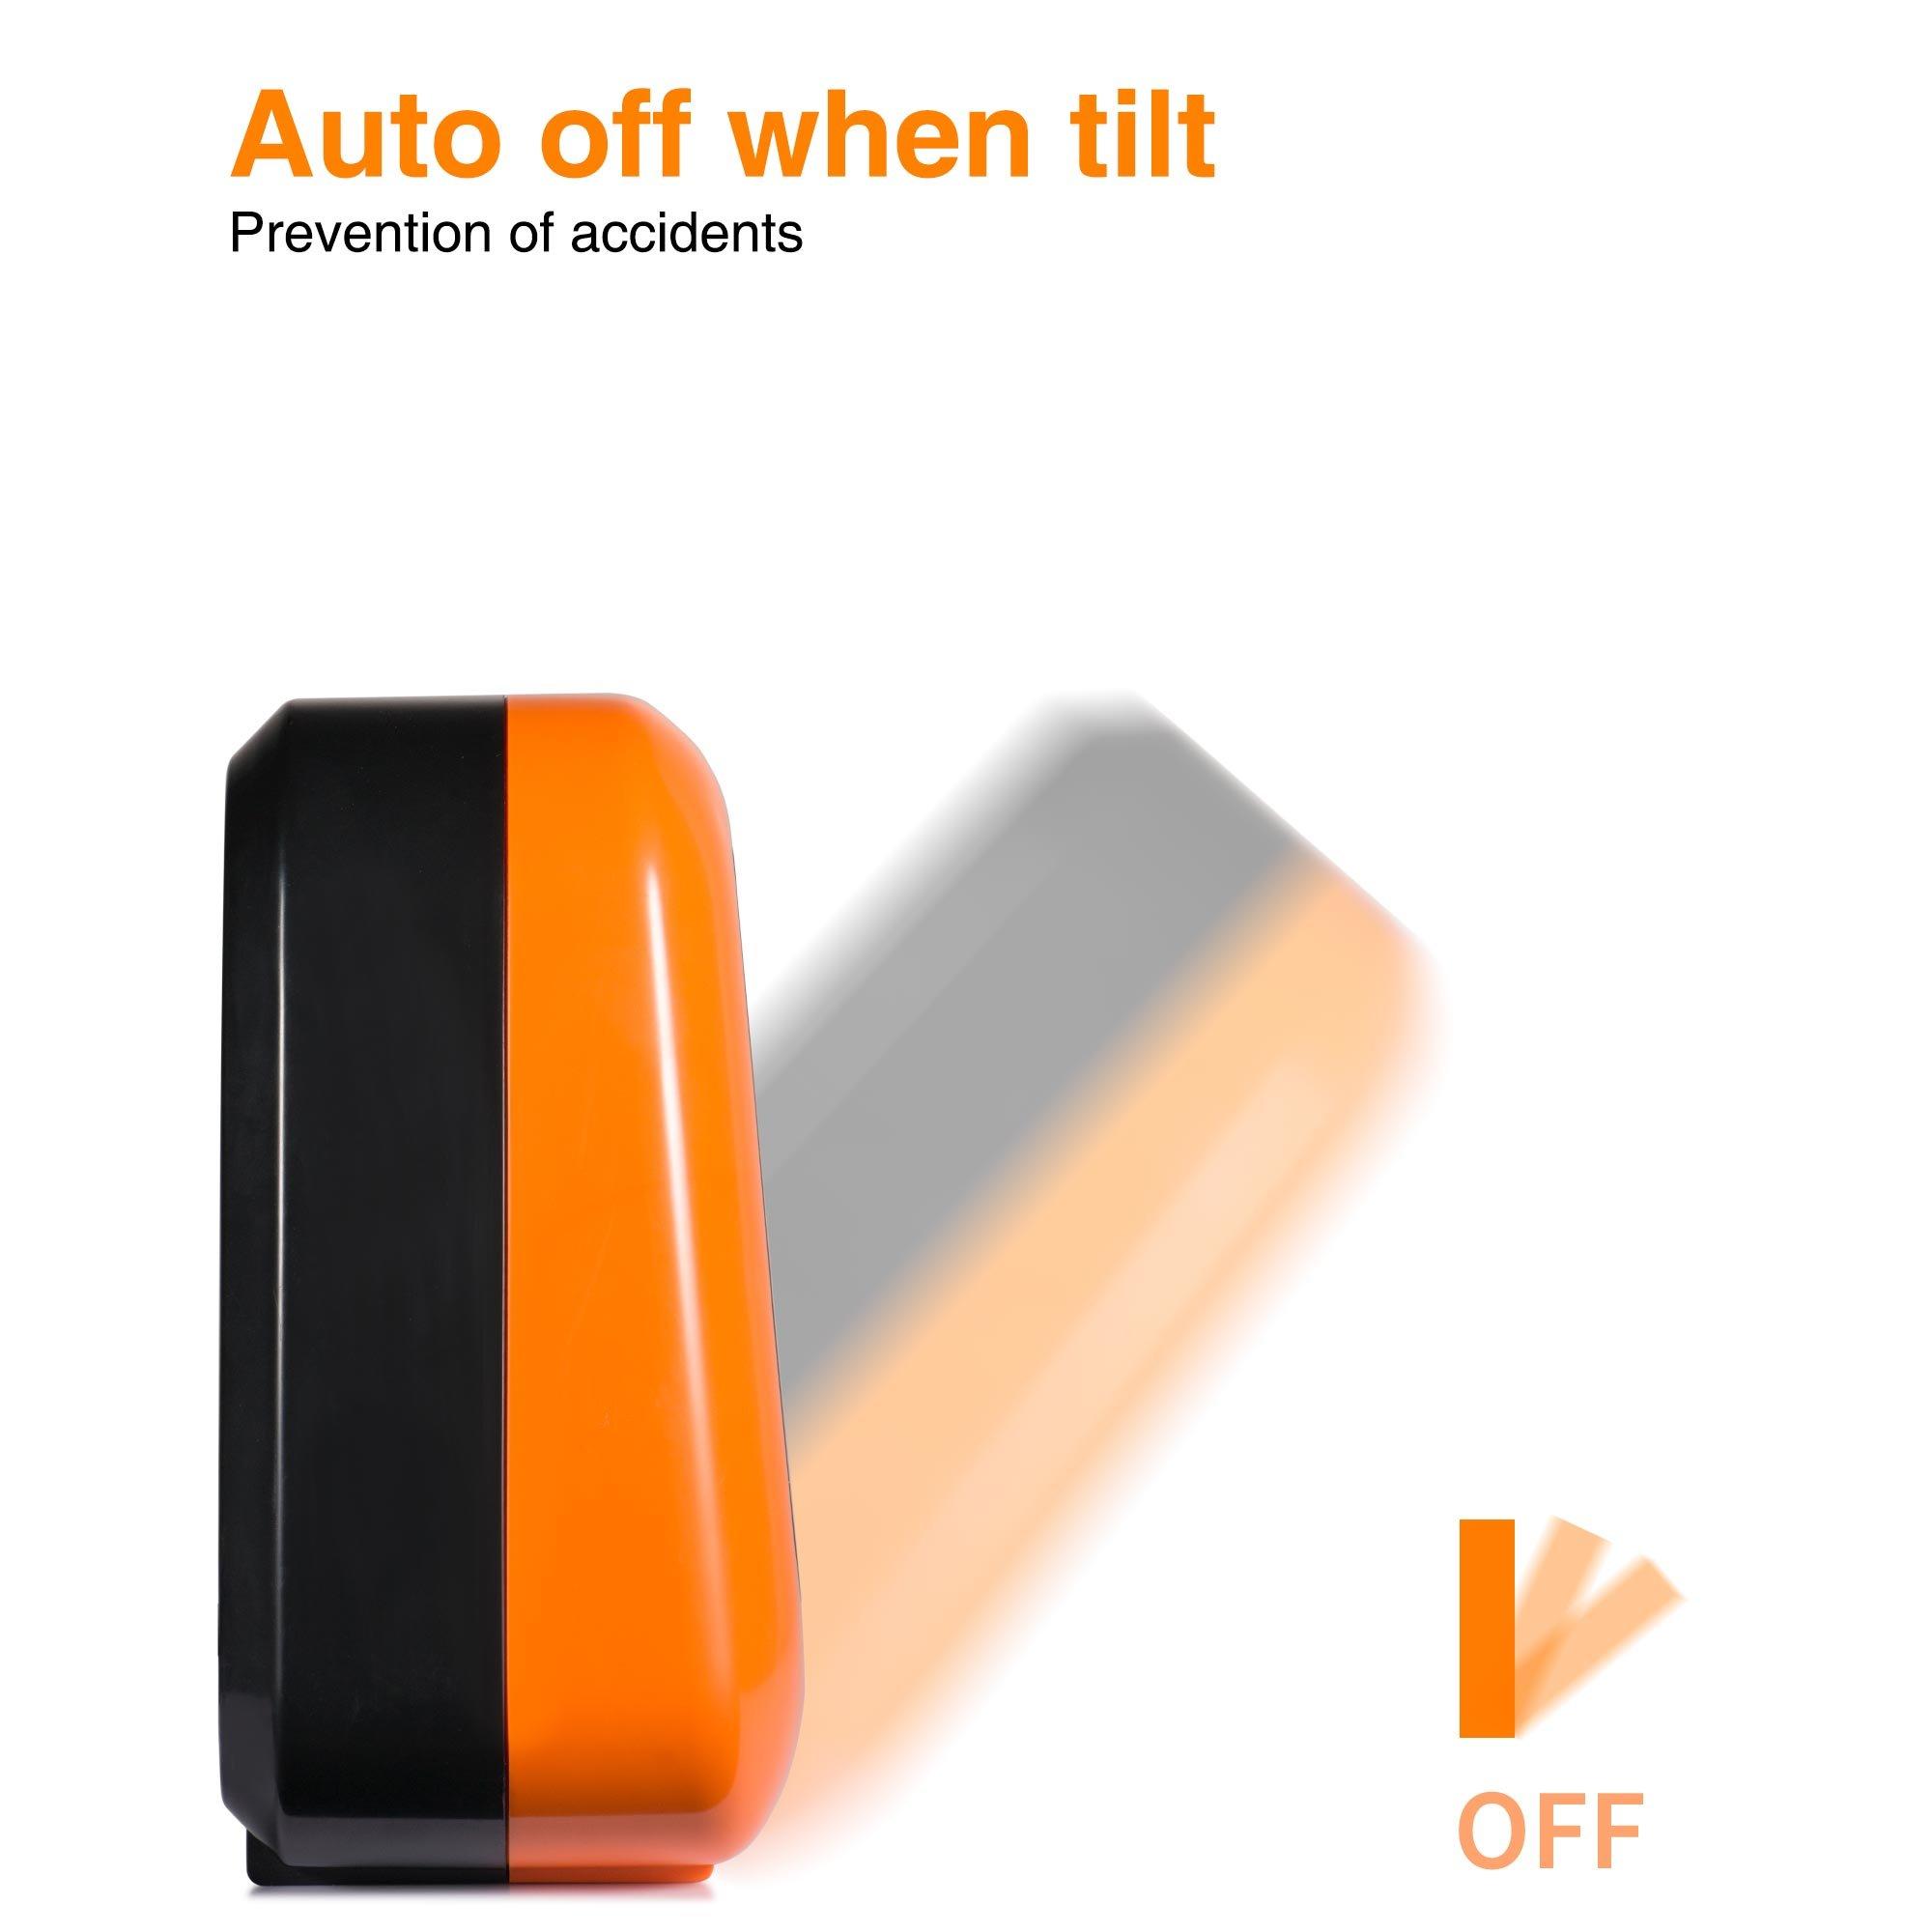 Personal Ceramic Portable-Mini Heater for Office Desktop Table Home Dorm, 400-Watt ETL Listed for Safe Use, Orange by Brightown (Image #4)